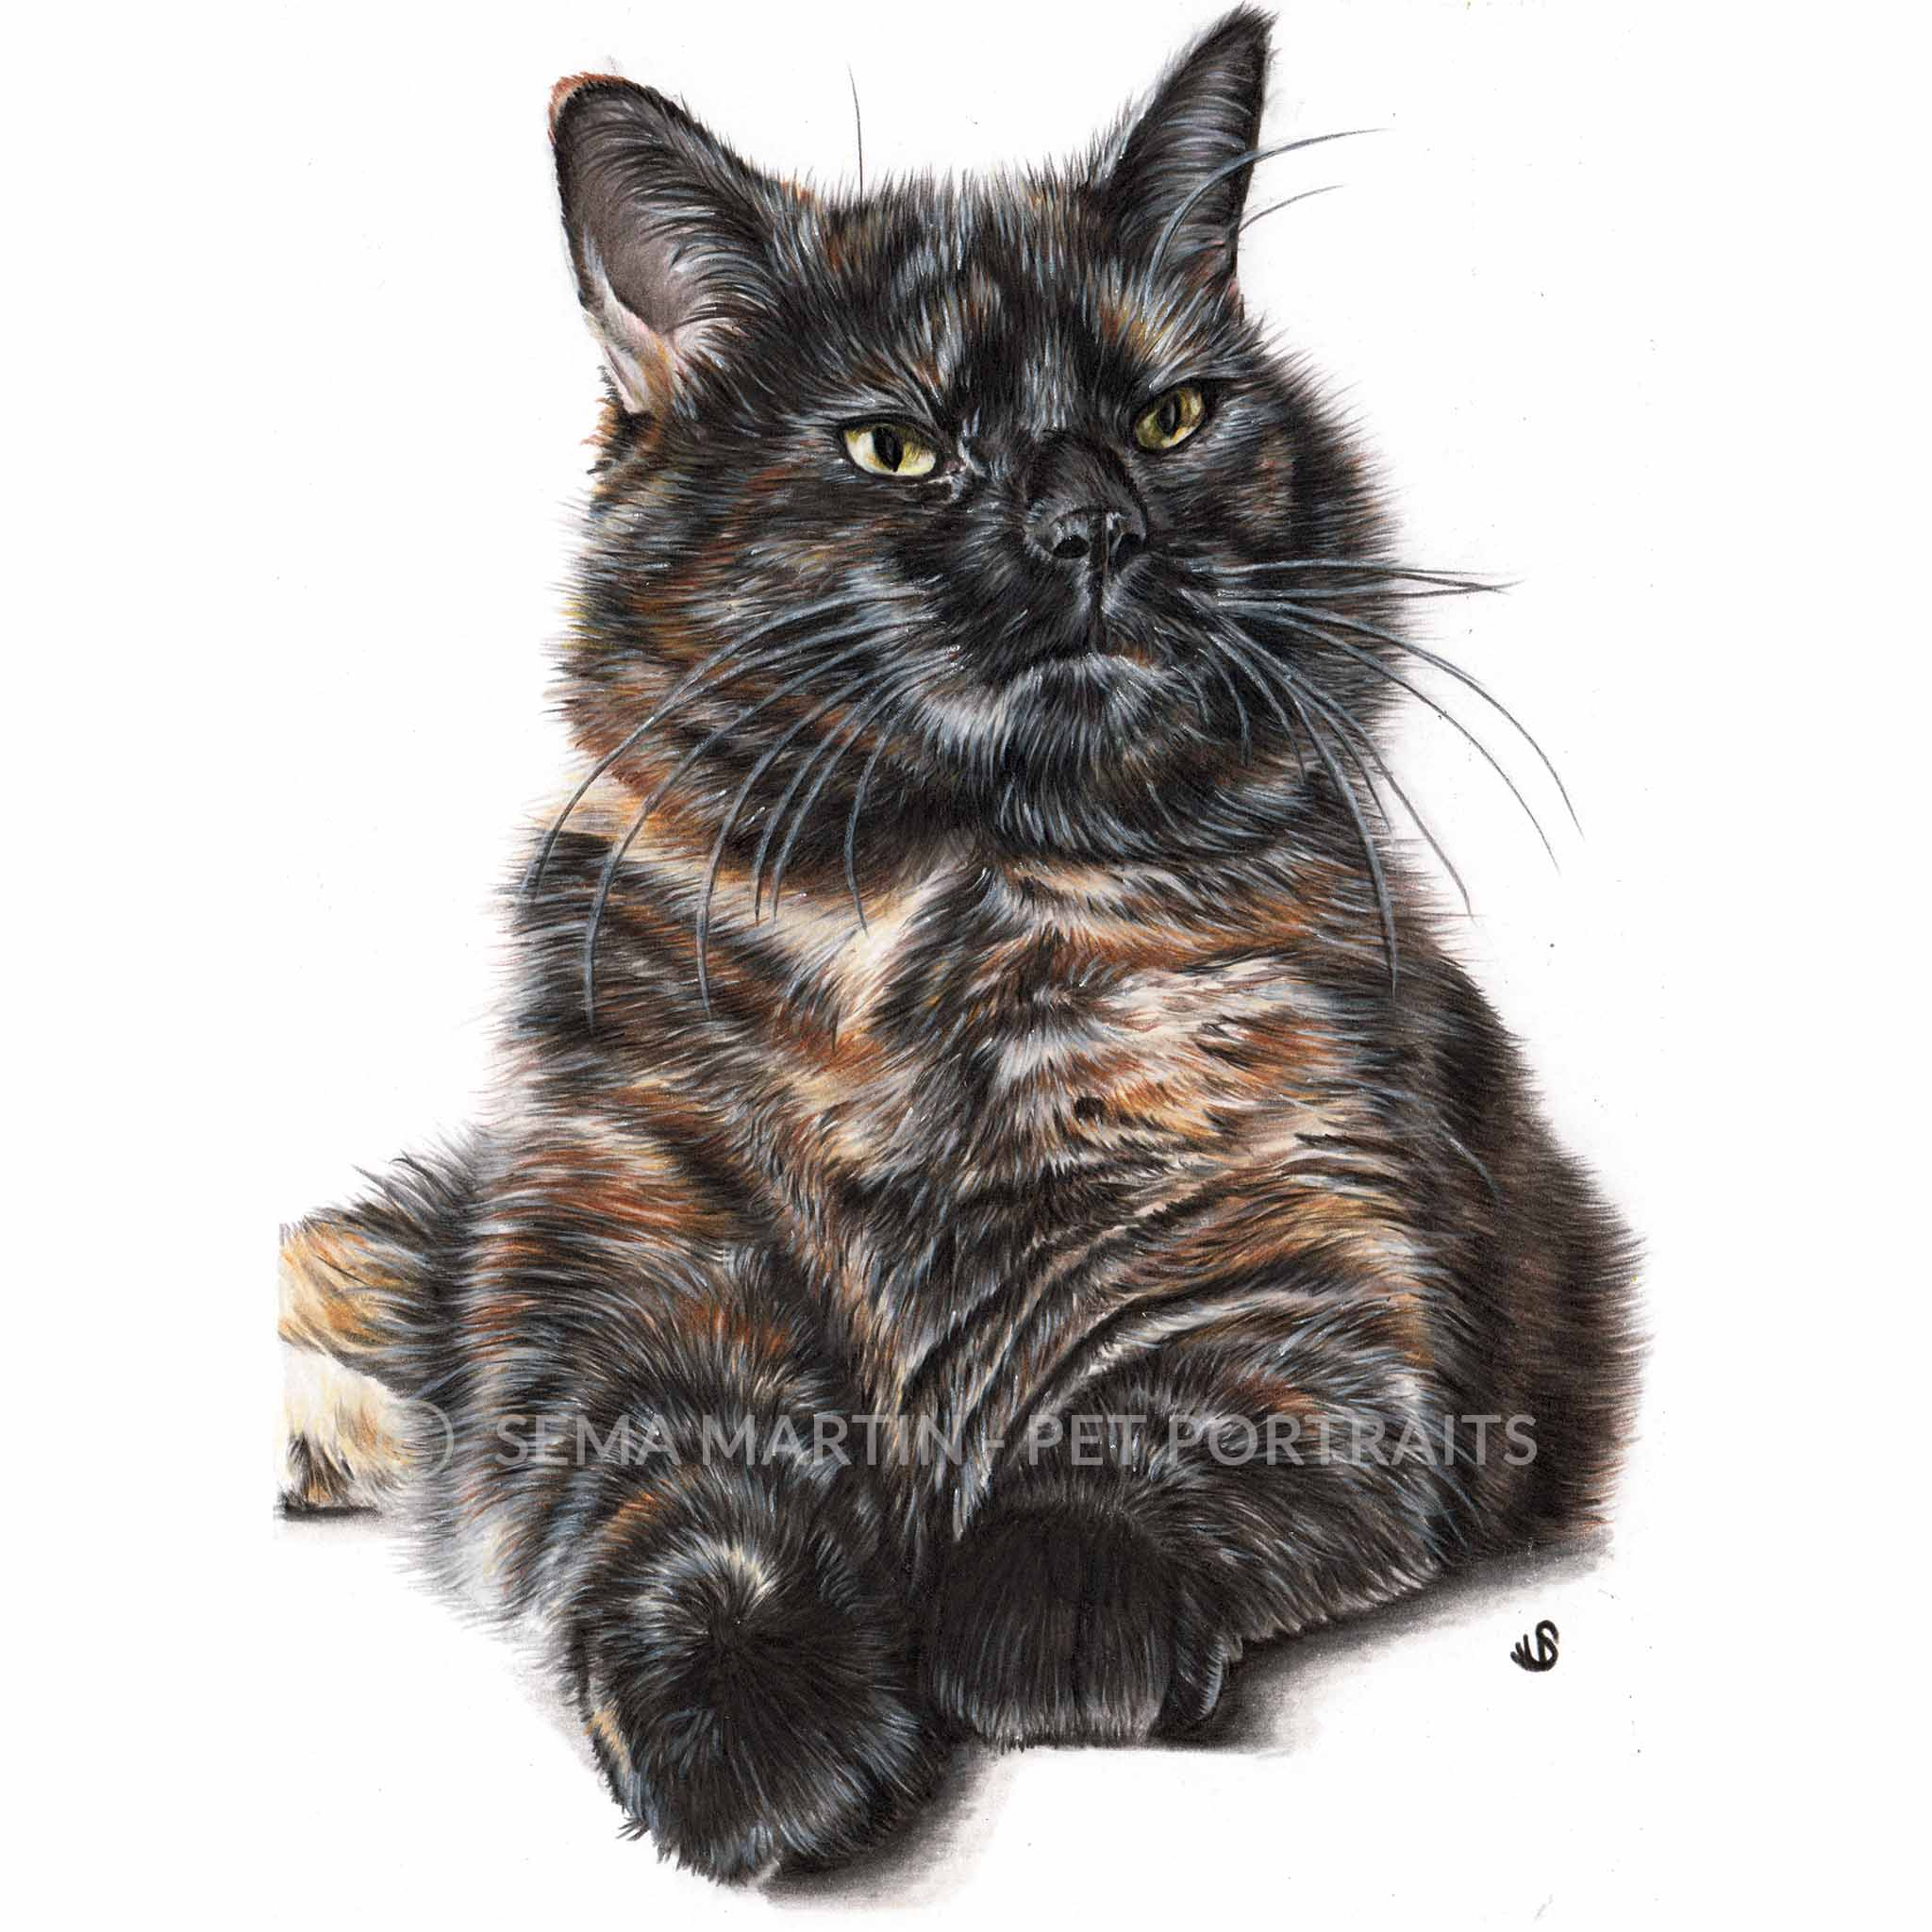 Tortie tortoisechell colour pencil cat portrait in Worcester uk by sema martin pet portrait artist